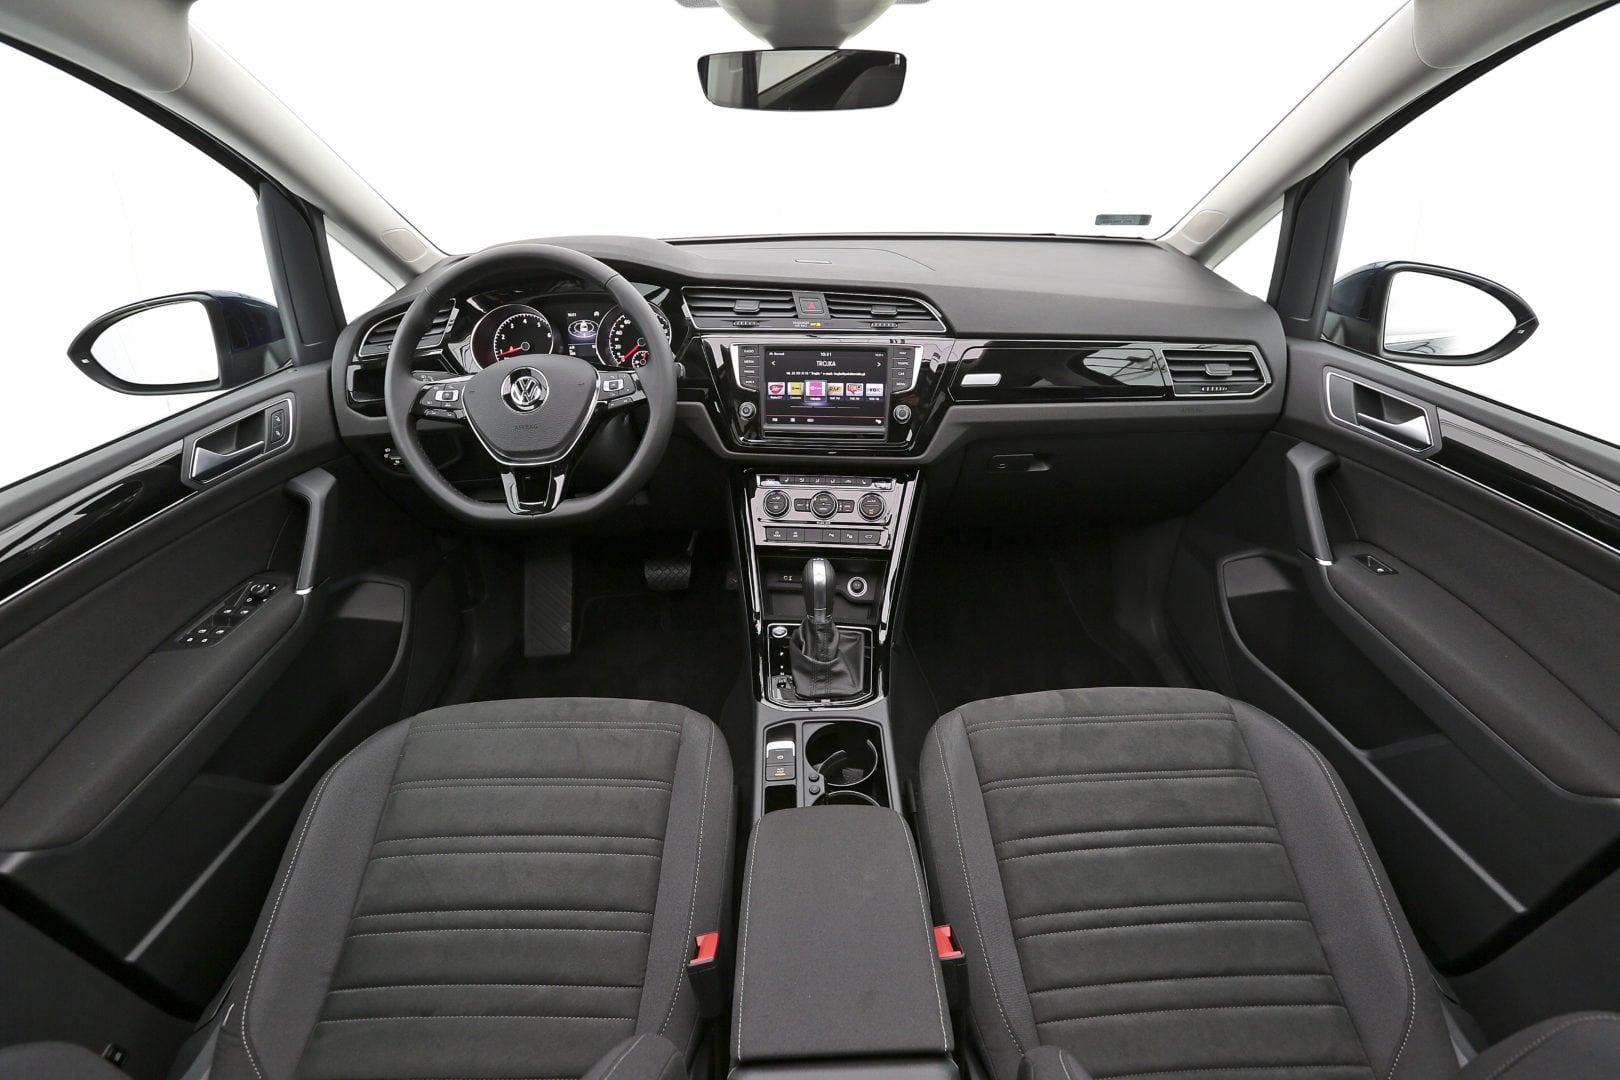 2016 touran cockpit